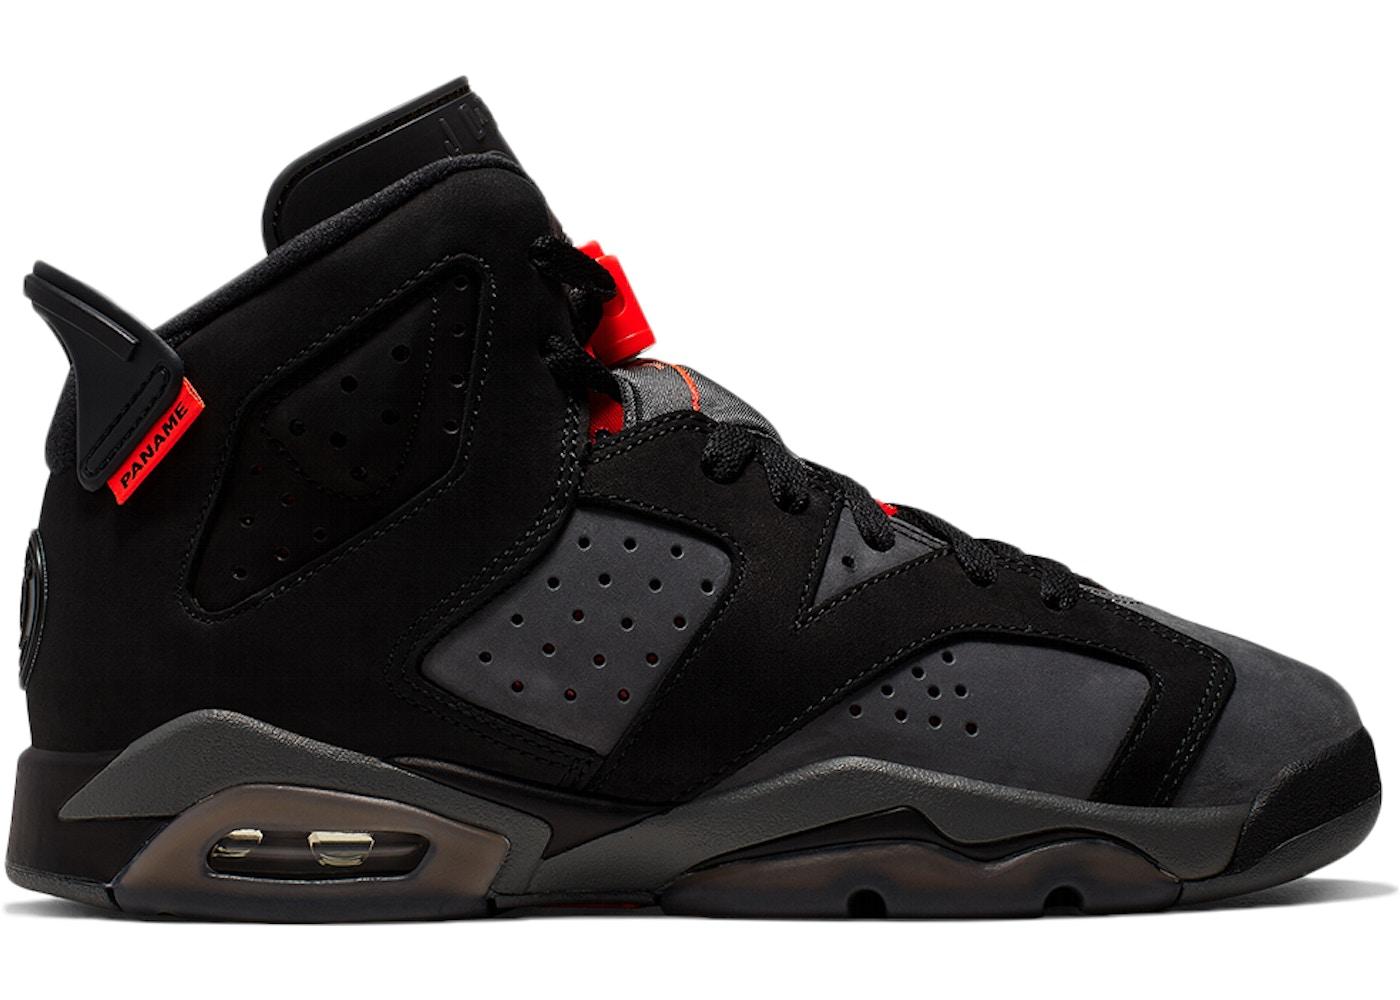 1b7fea00 Buy Air Jordan 6 Shoes & Deadstock Sneakers